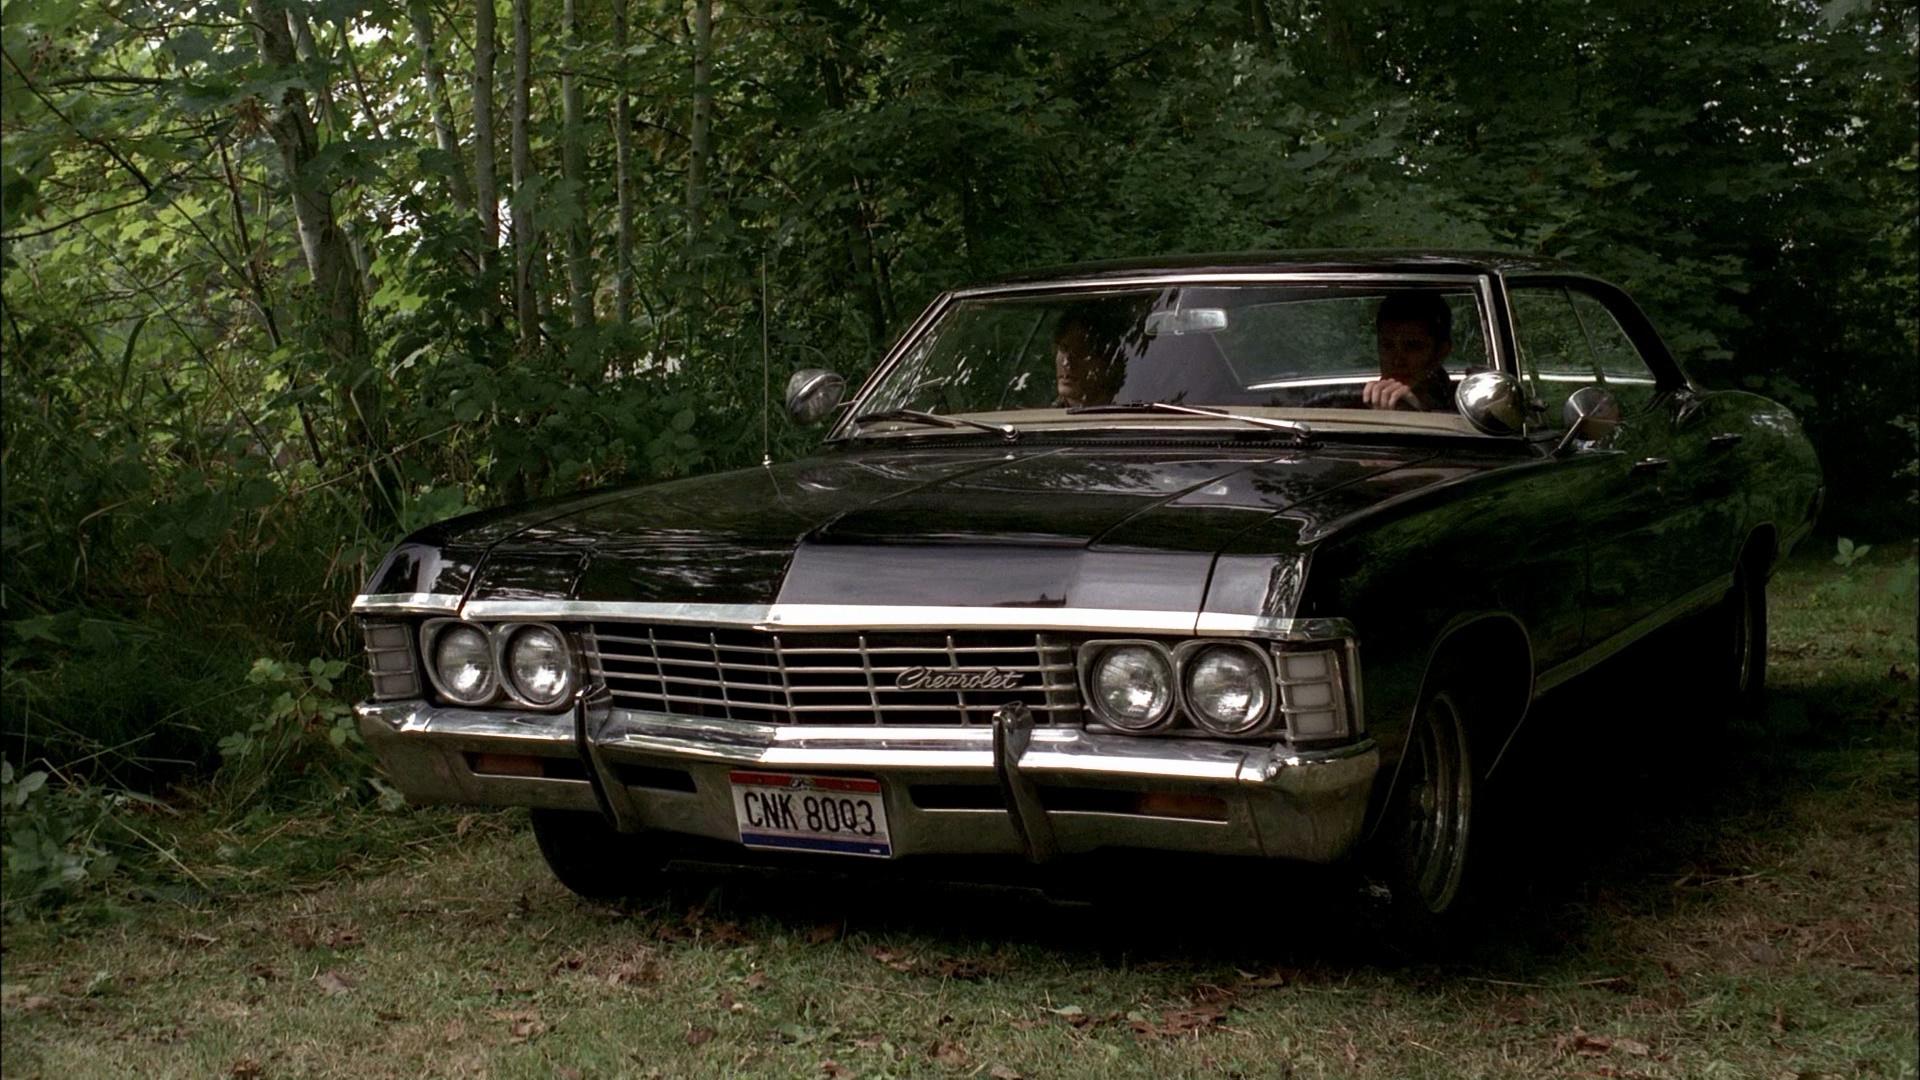 Supernatural car chevrolet impala green supernatural tree tv 1920x1080